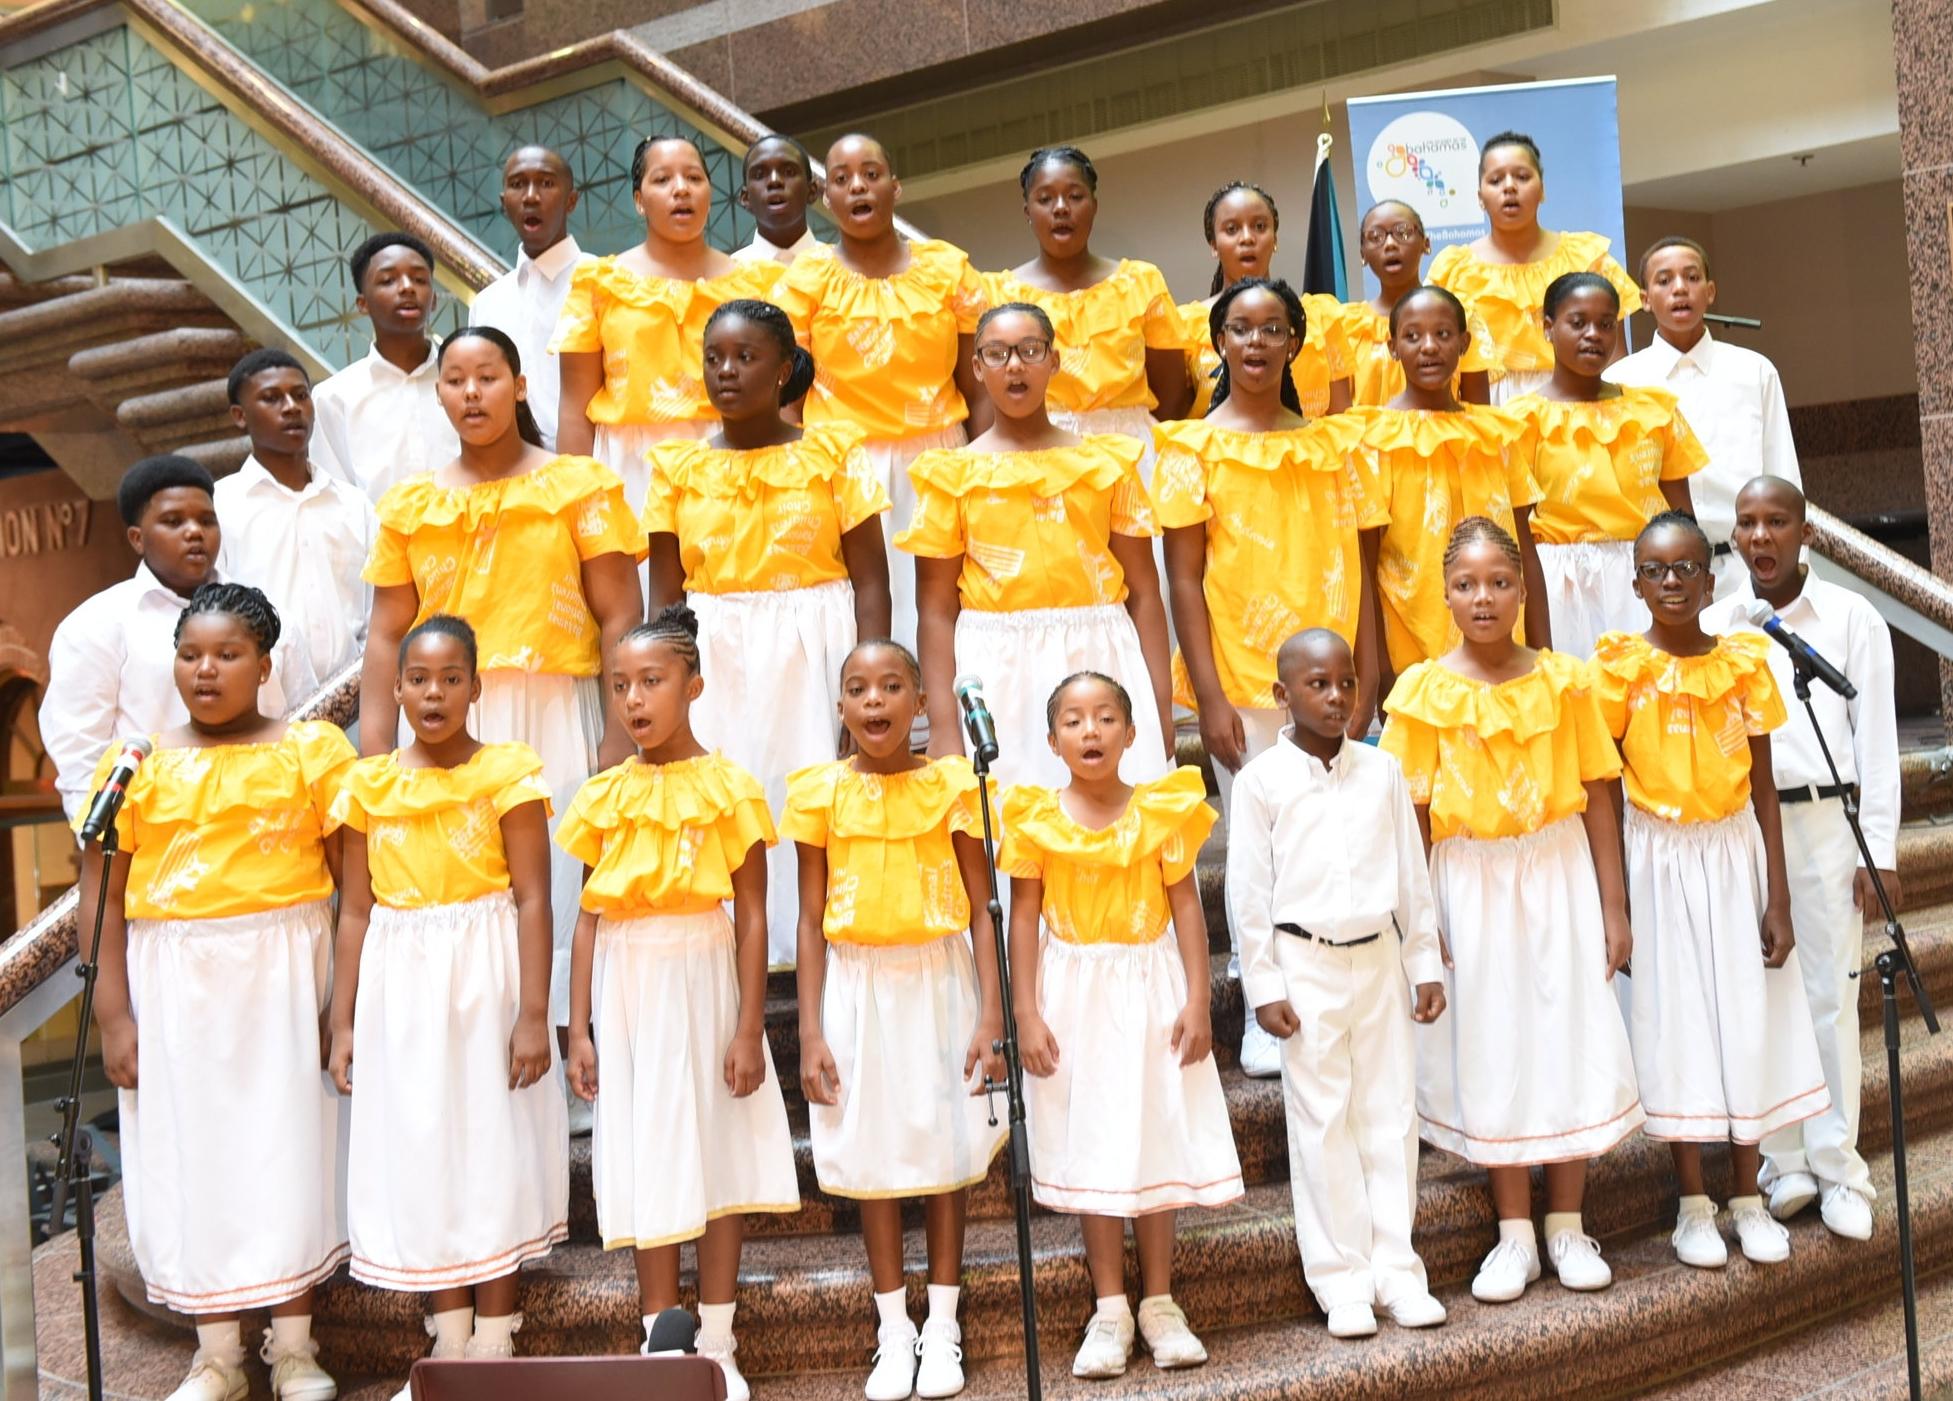 National Children's Choir of the Bahamas